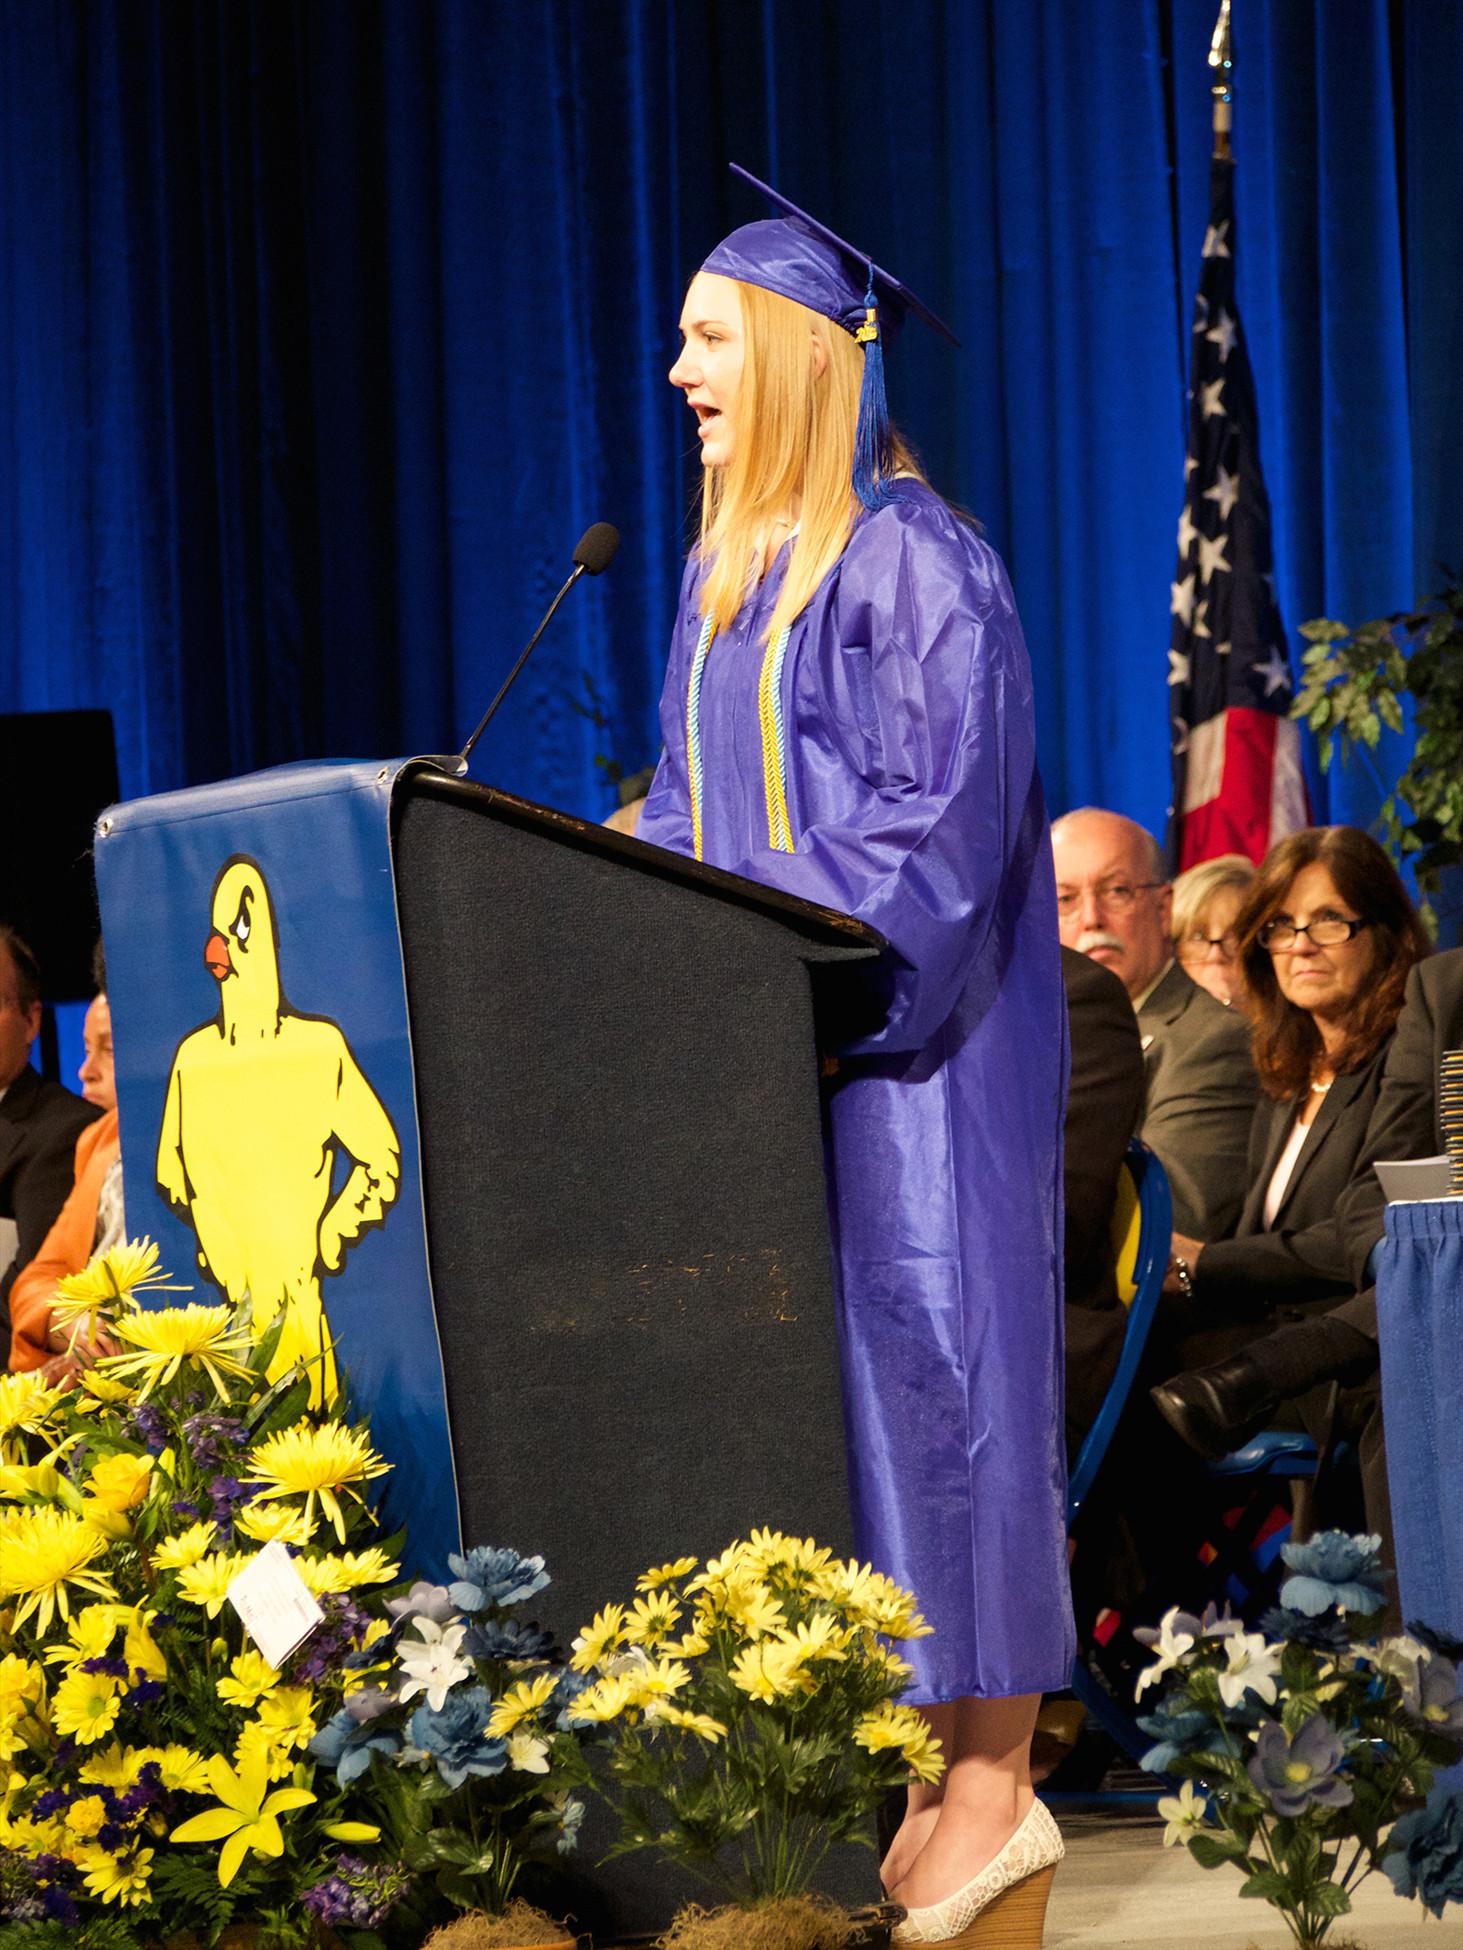 Jessica Naomee william allen high school awards 602 diplomas - the morning call